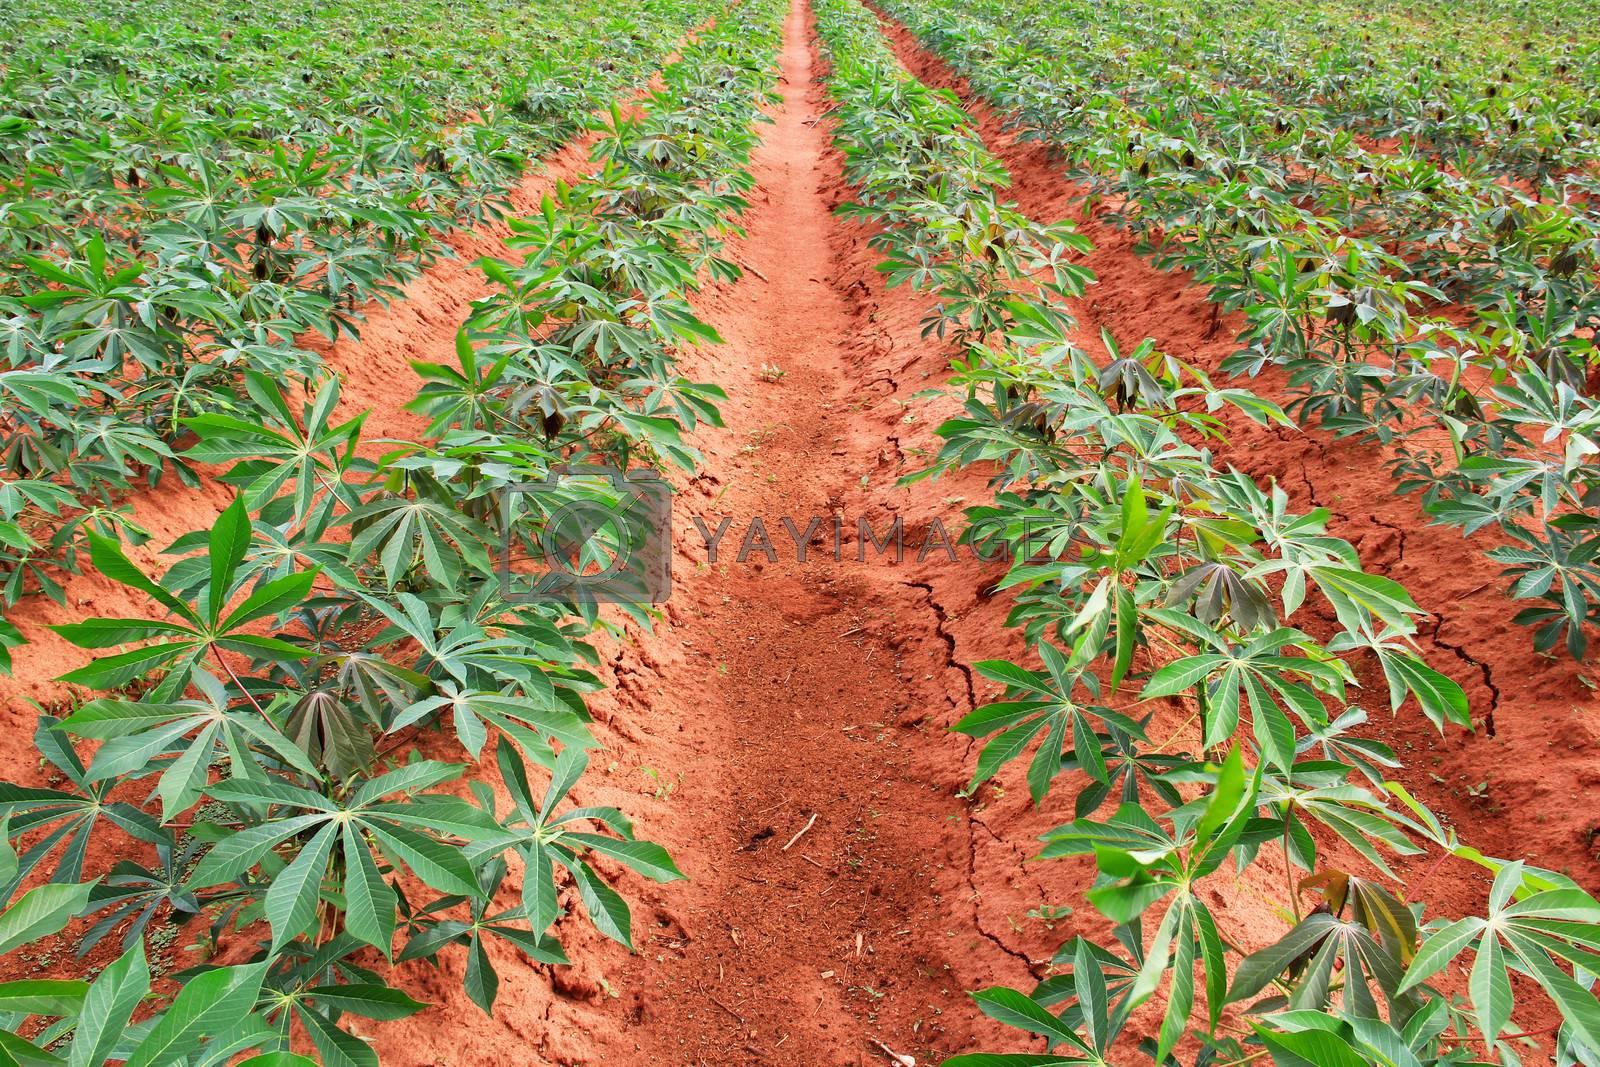 Cassava or tapioca plant field in Thailand